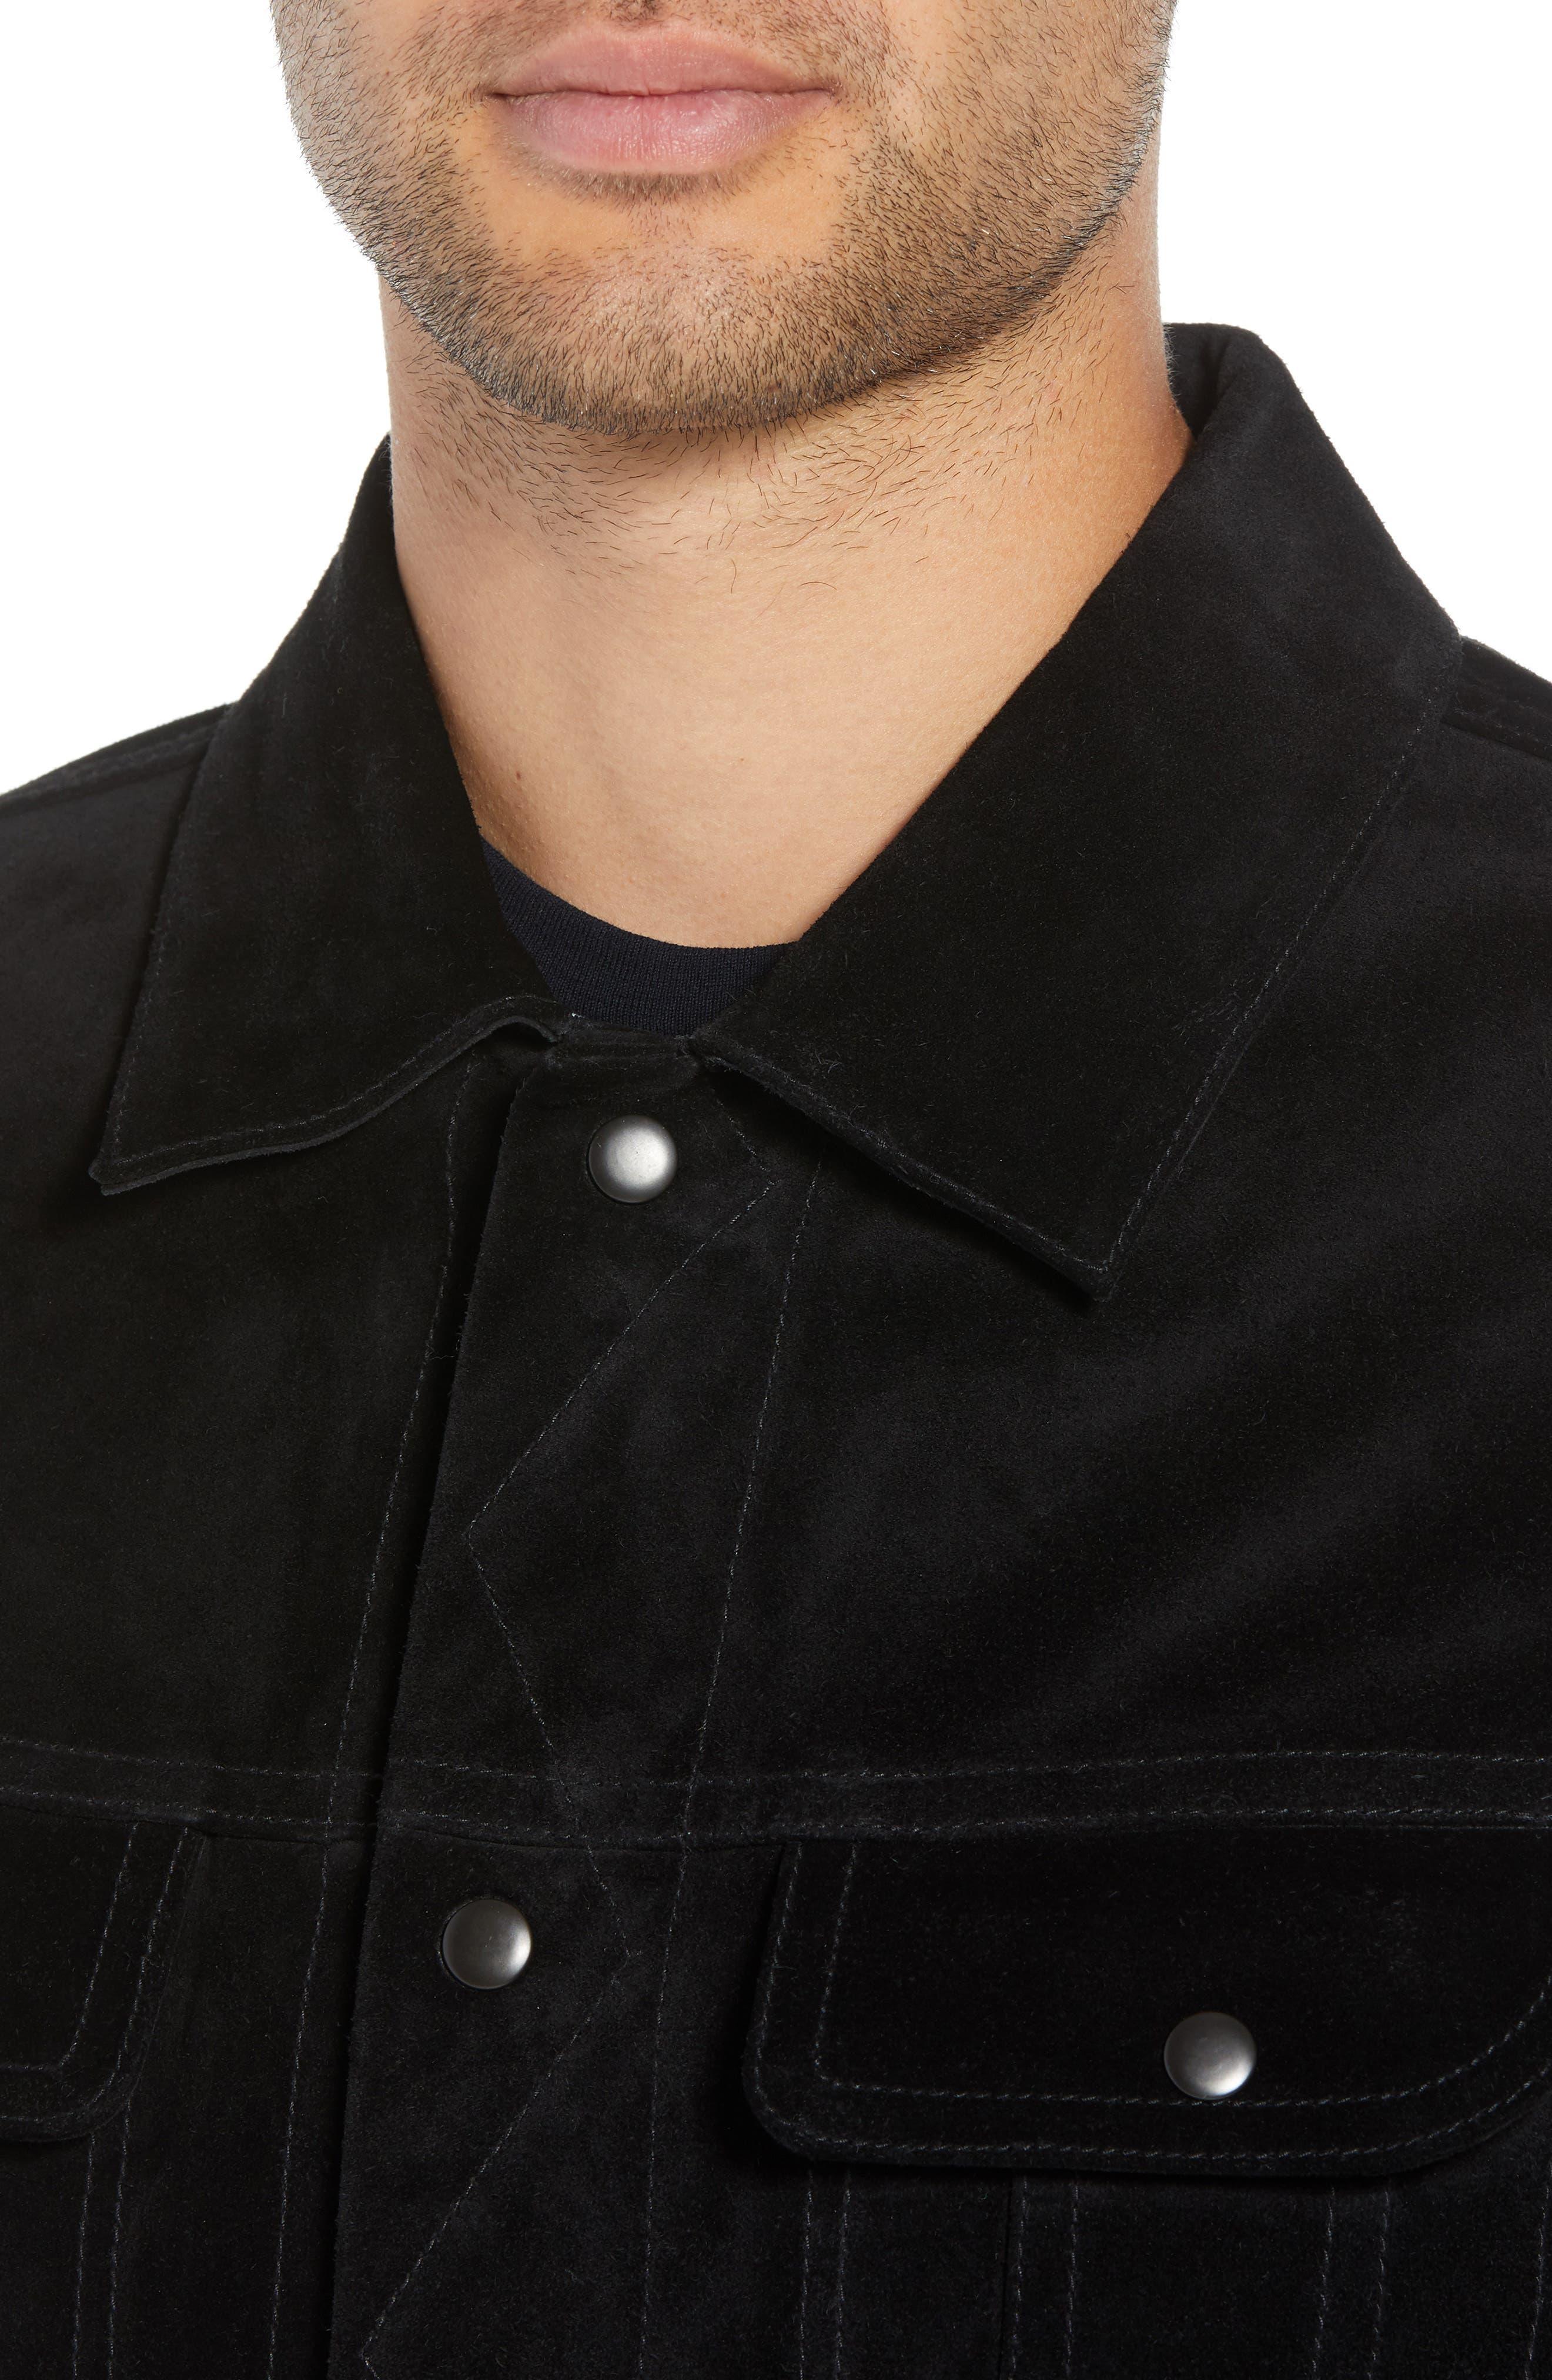 Regular Fit Suede Trucker Jacket,                             Alternate thumbnail 4, color,                             BLACK